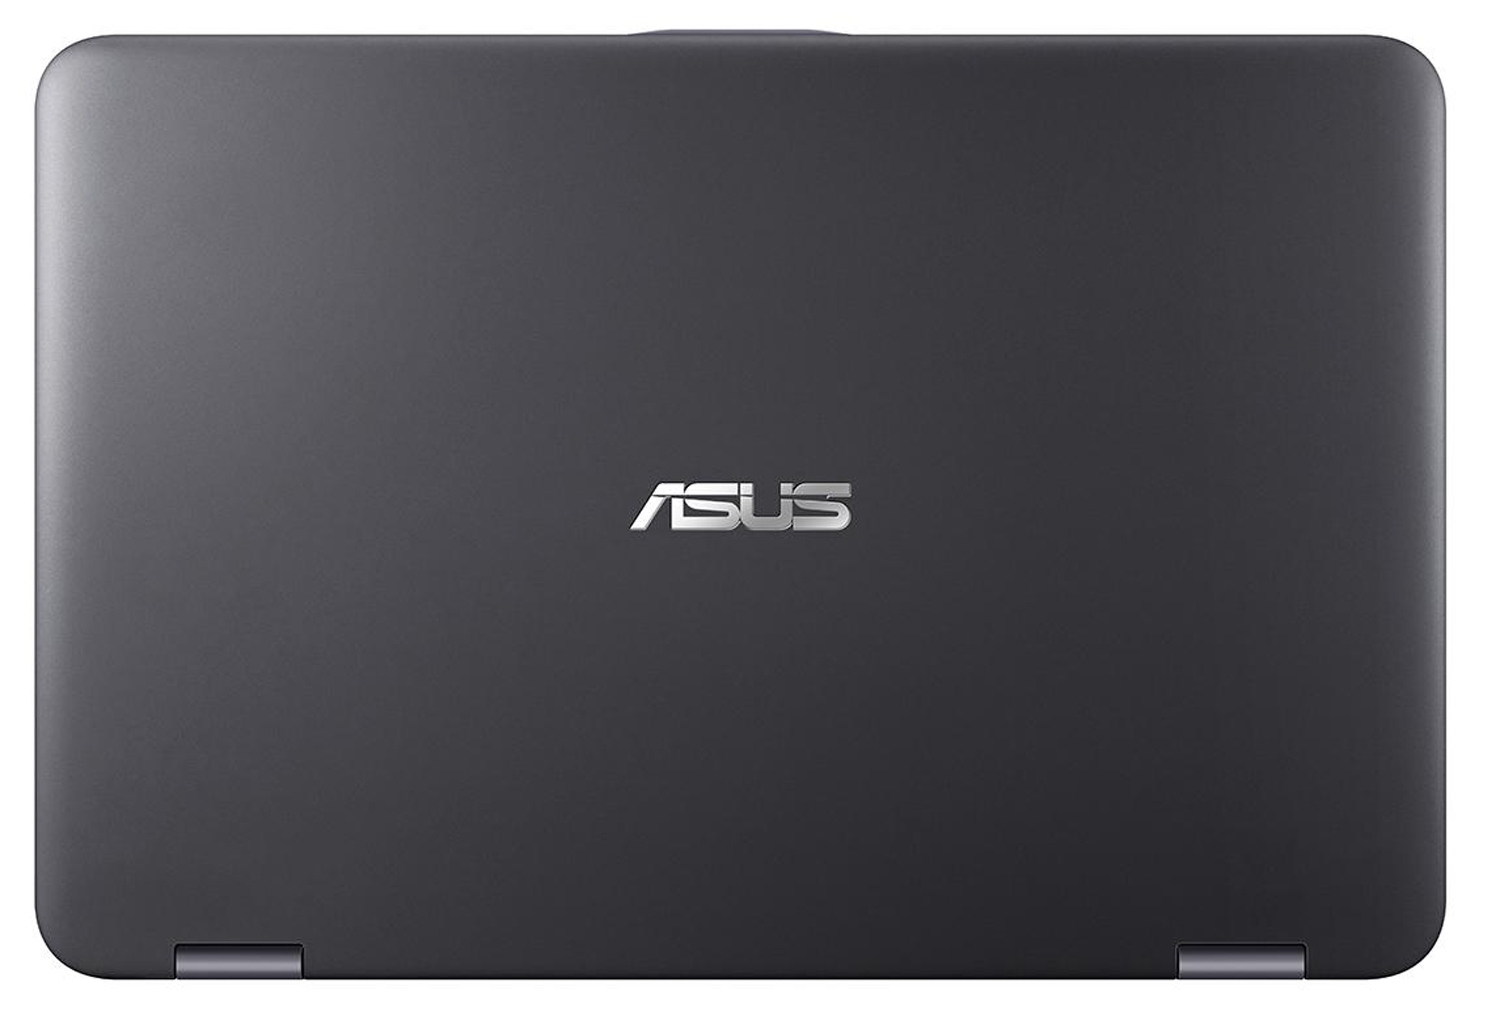 1da763ea275b Asus VivoBook Flip 12 TP203NAH (N4200, HD) Laptop Review ...